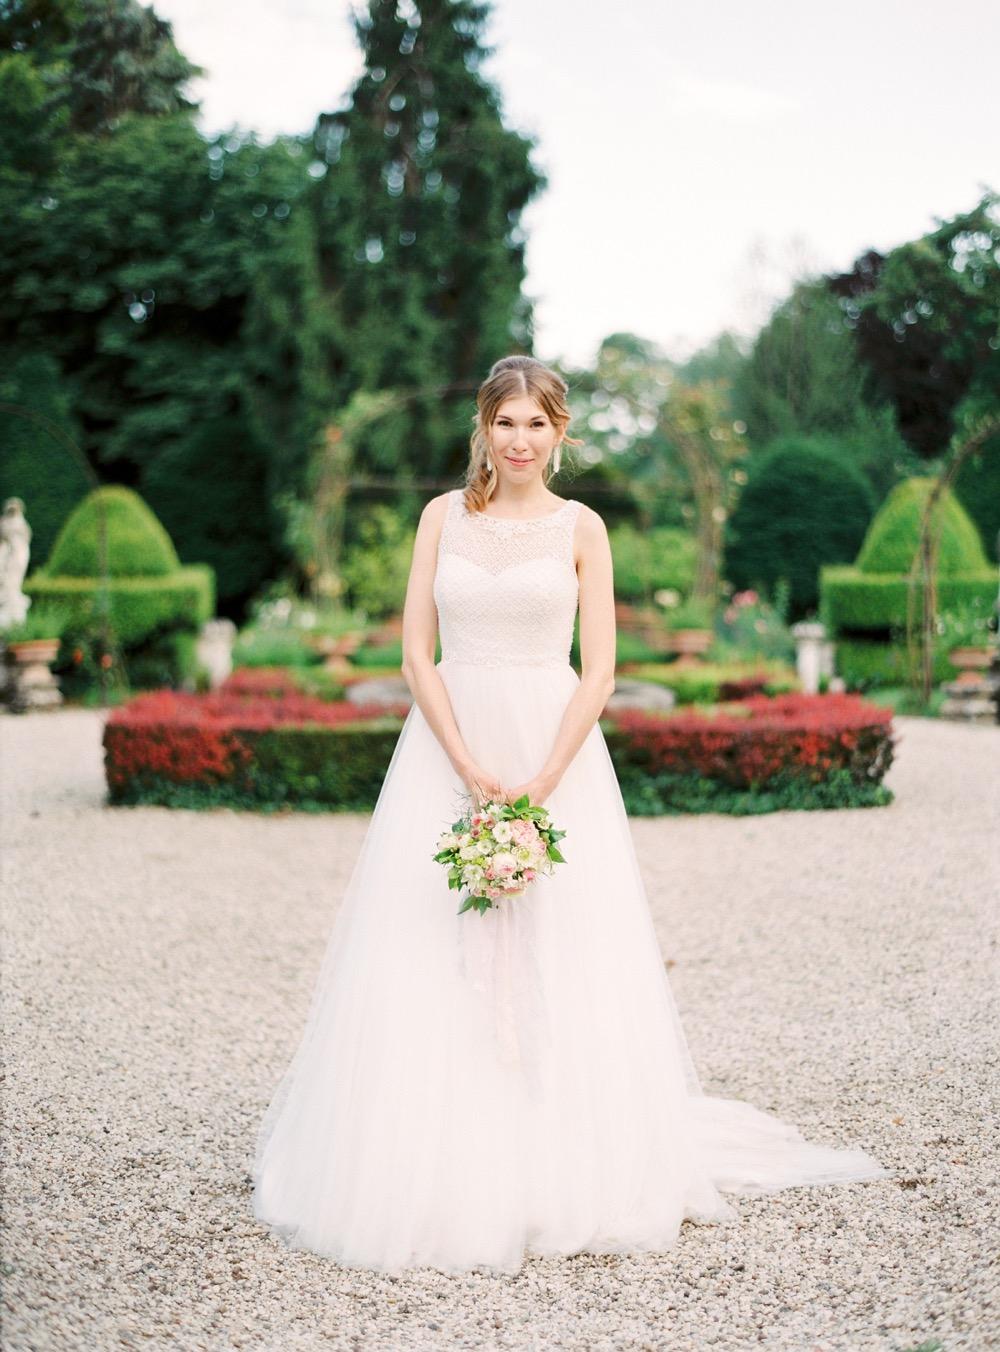 darya kamalova thecablookfotolab fine art film fhotographer in italy destination wedding como lake villa regina teodolinda villa pisani scalabrin-114